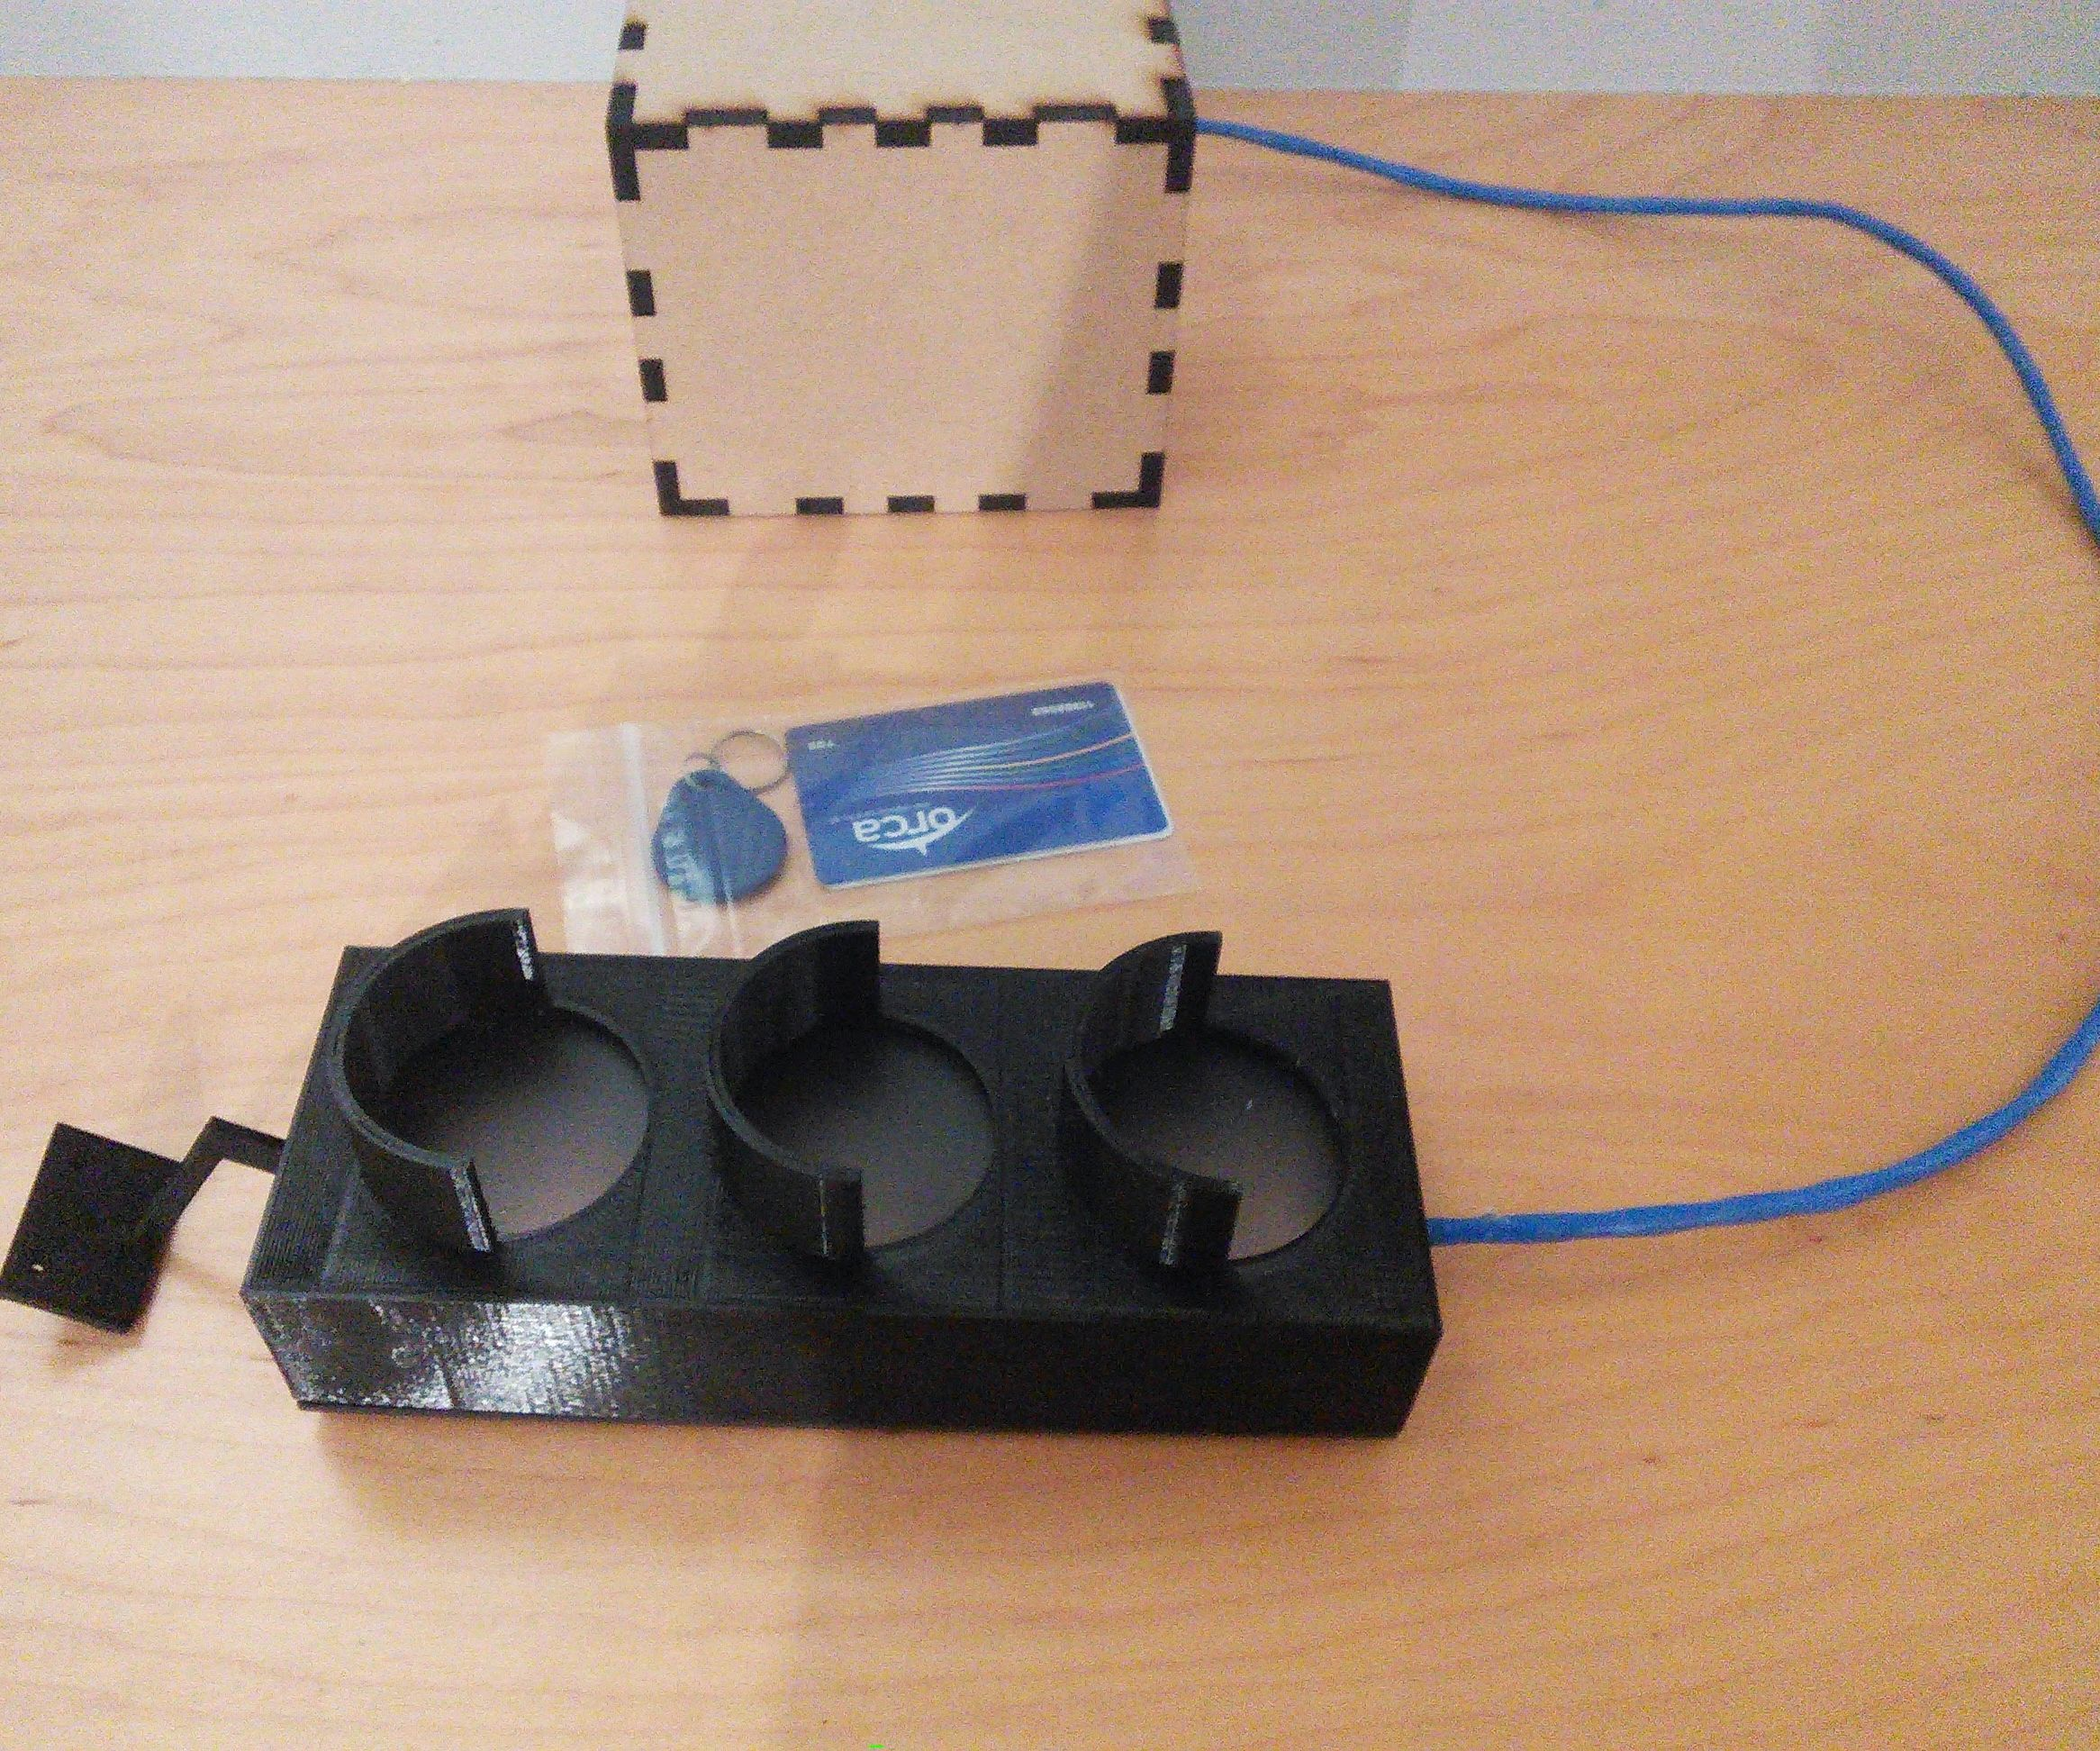 RFID access system